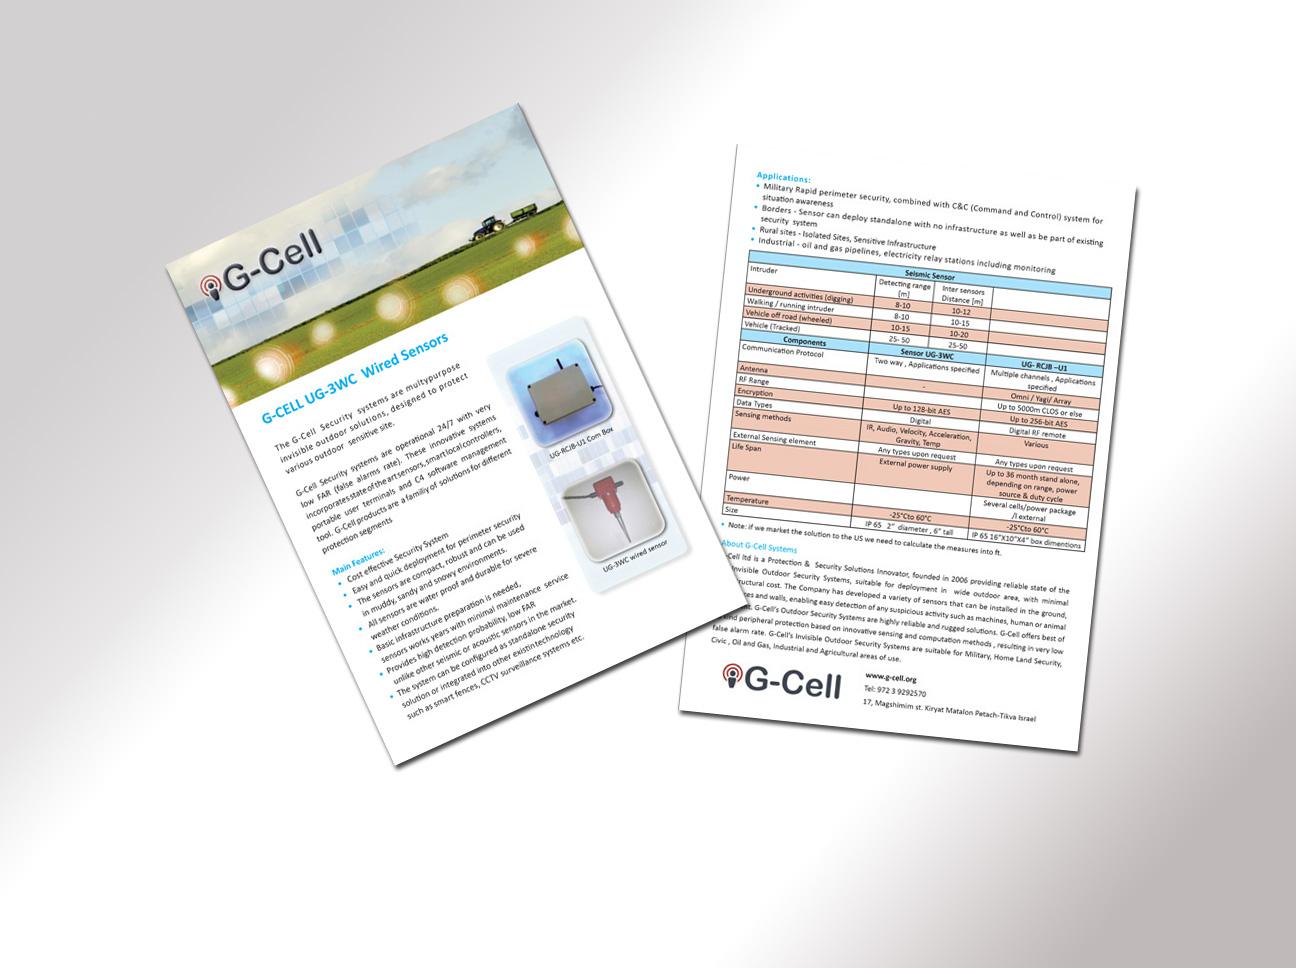 G-Cell brochure